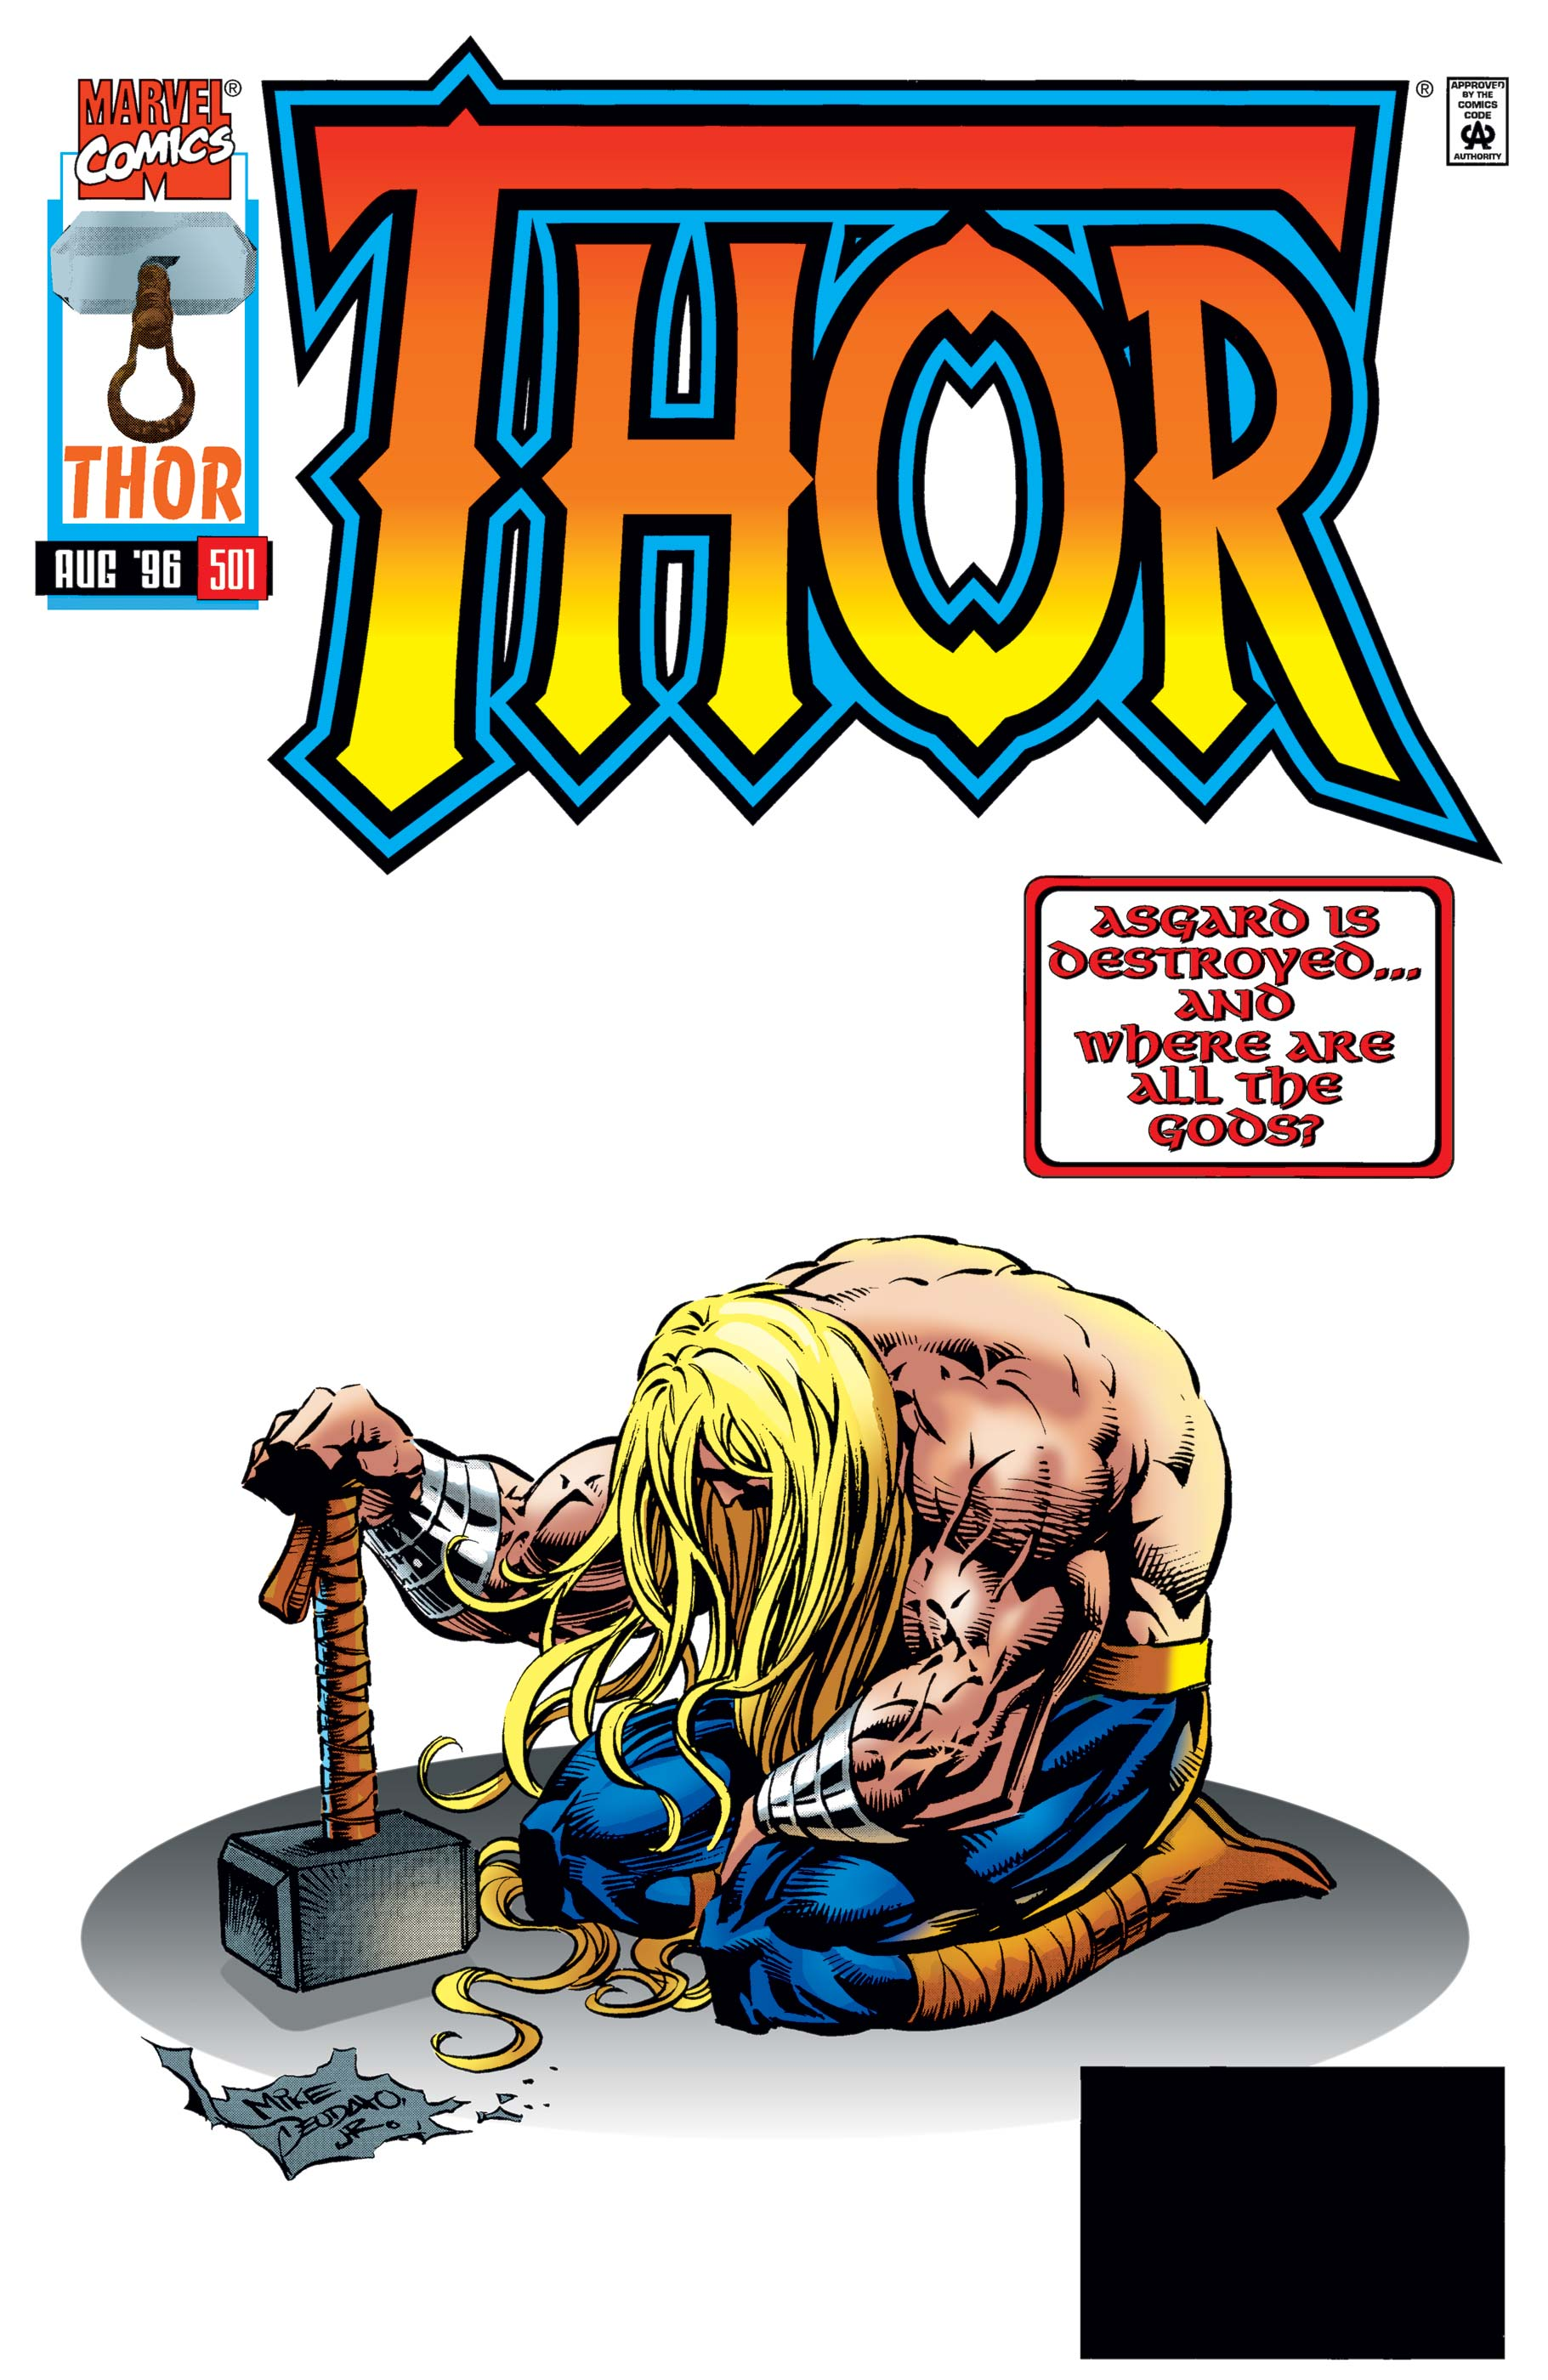 Thor (1966) #501